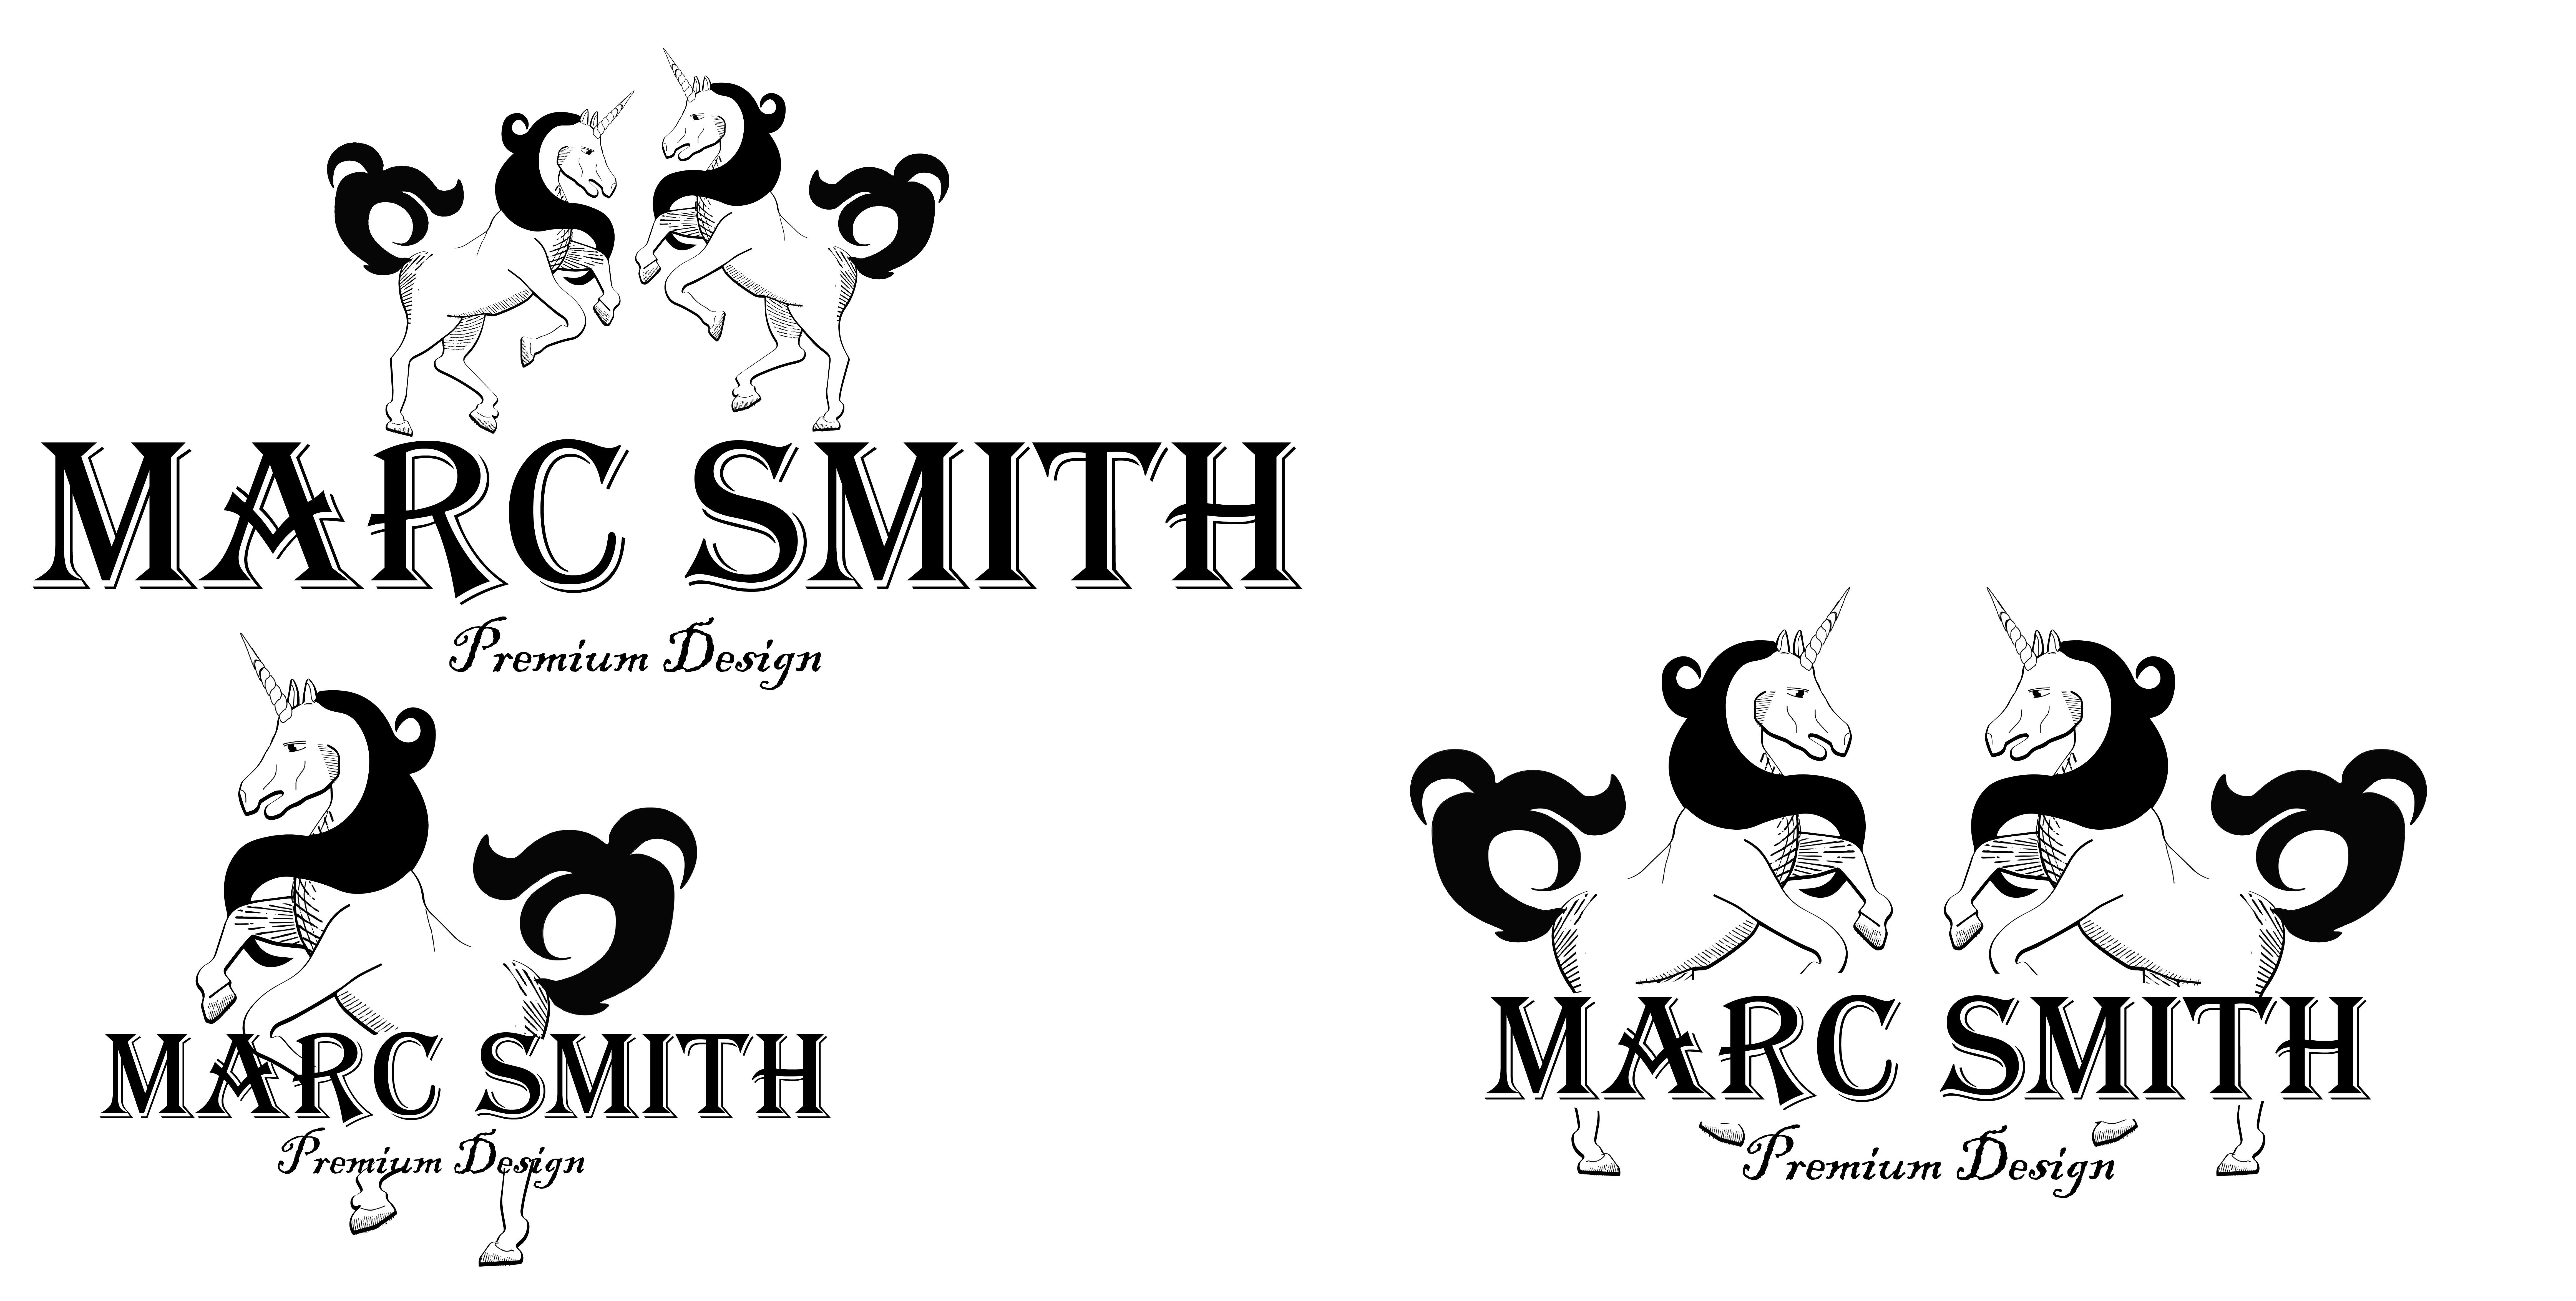 Разработка логотипа для ЛИЧНОГО БРЕНДА.  фото f_1385d00060a6955c.jpg